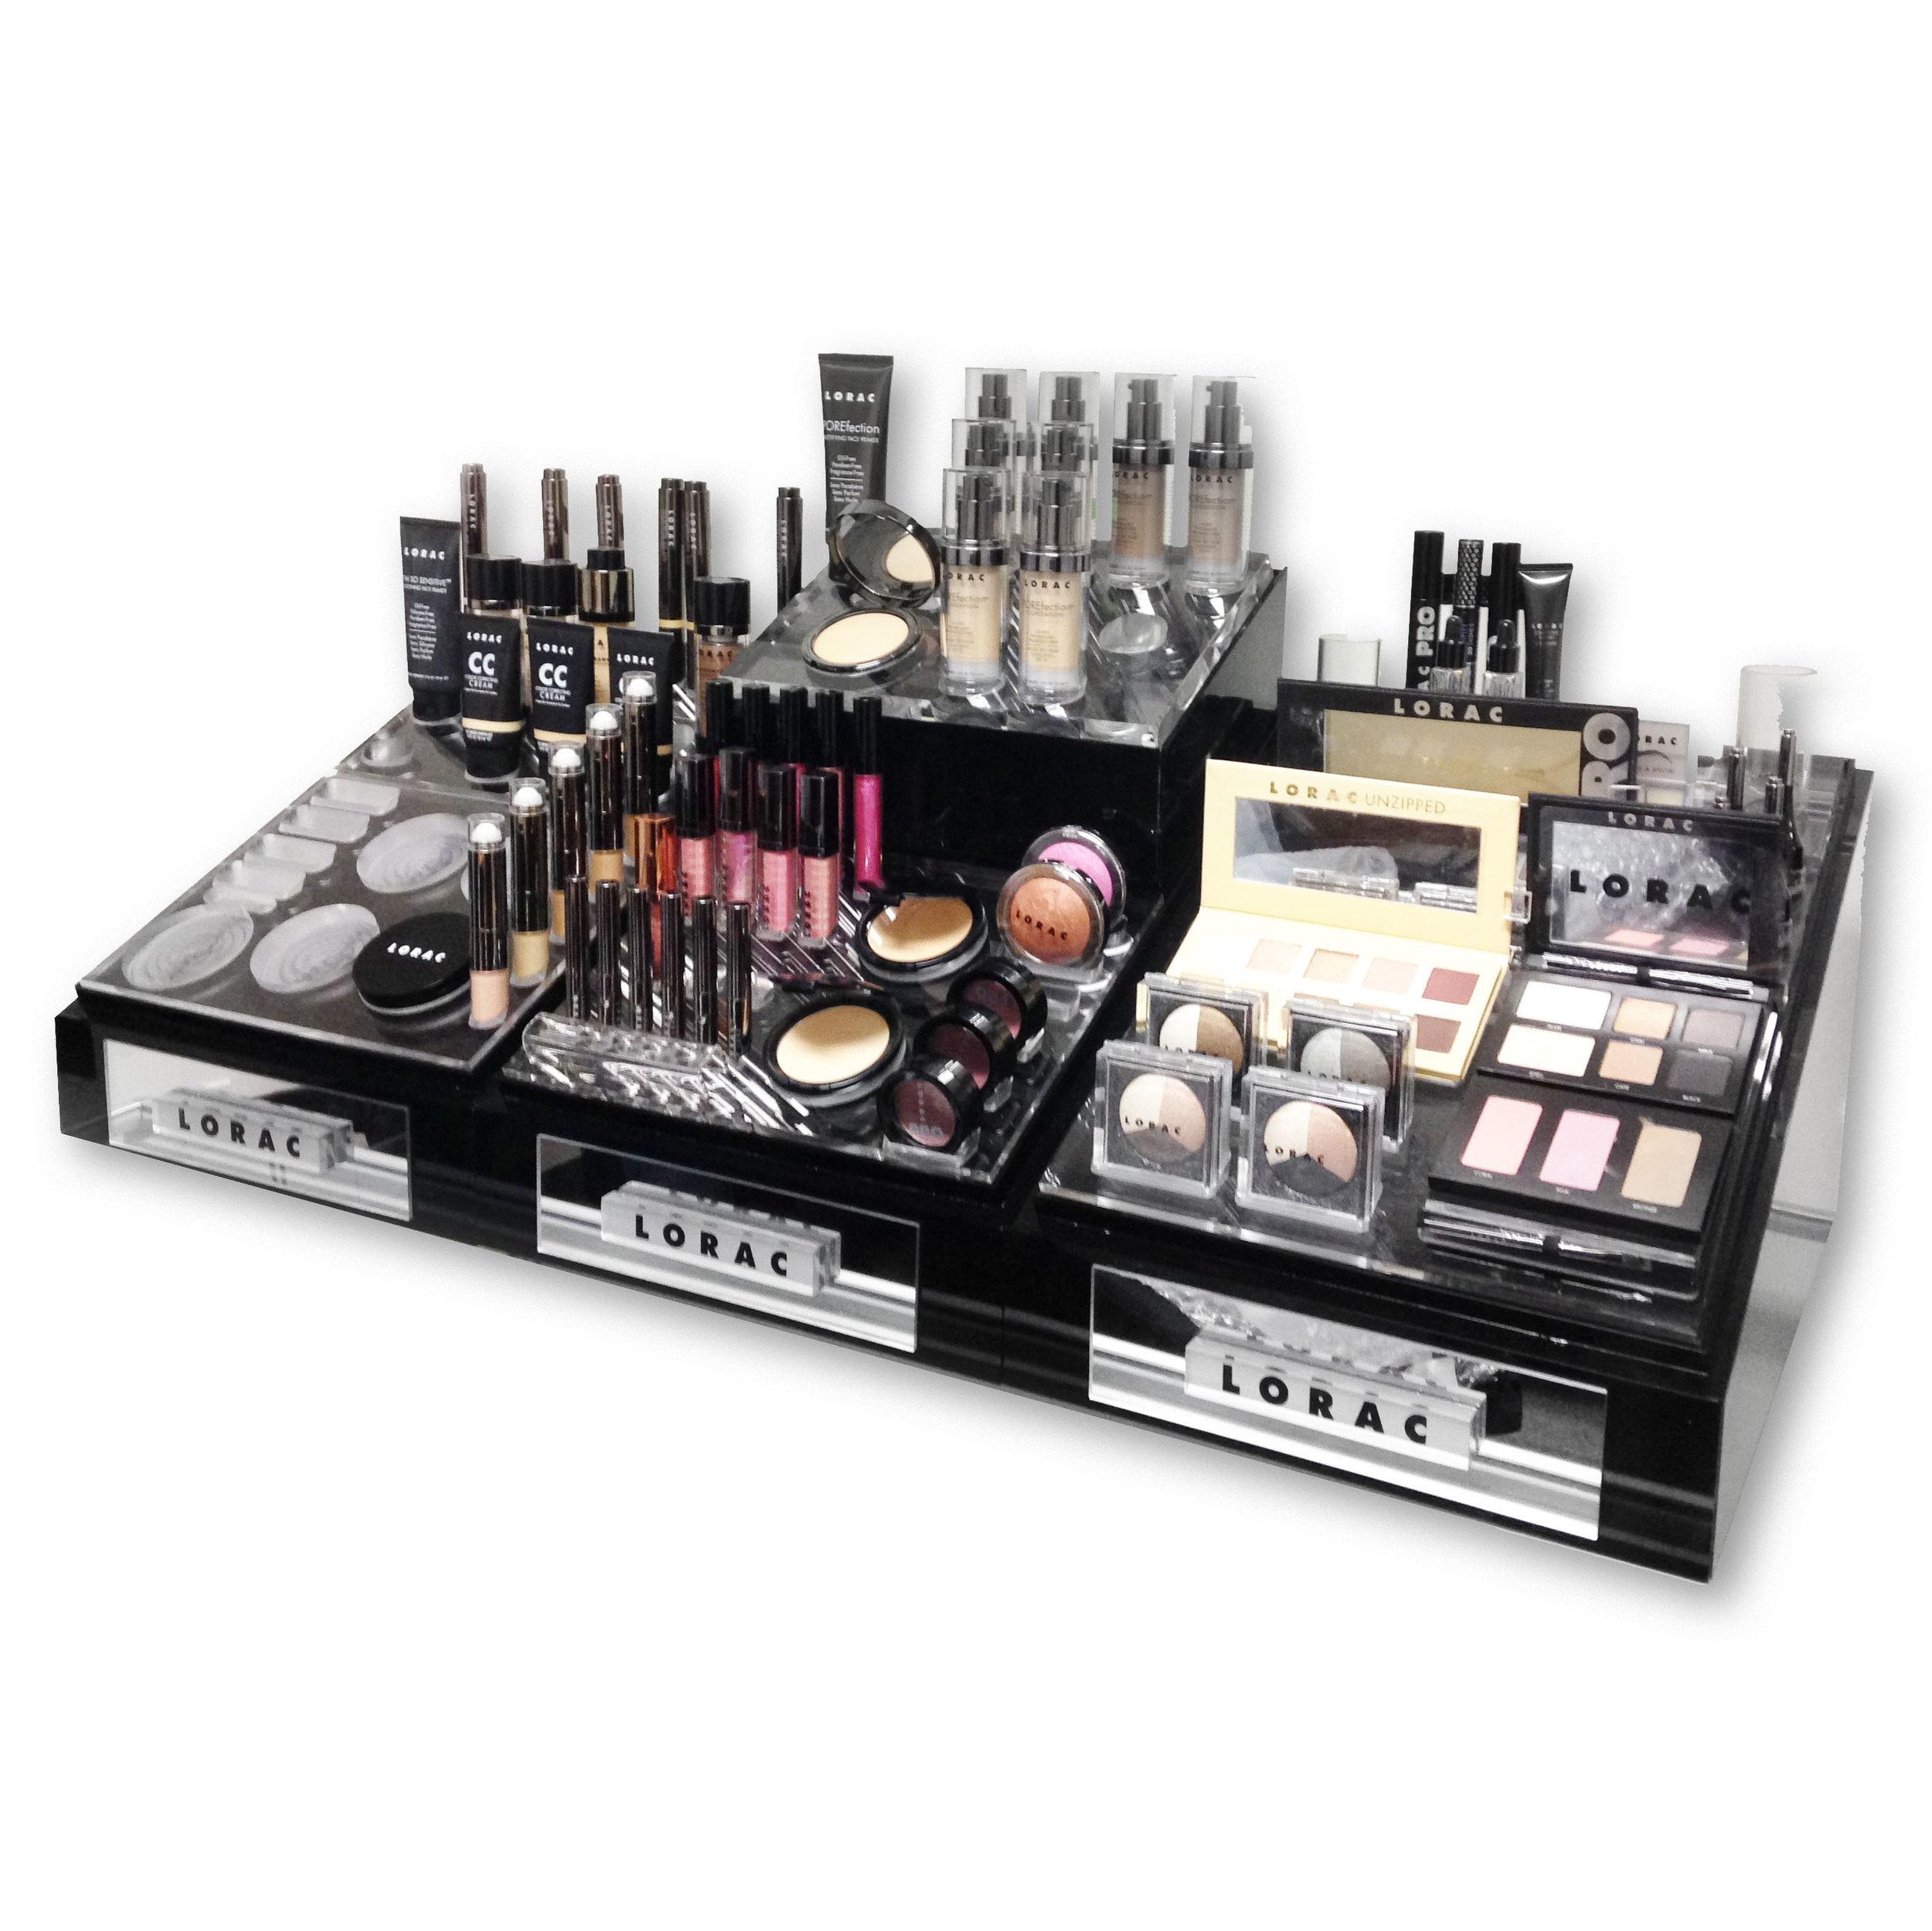 Lorac Cosmetics  - Master Tester Unit